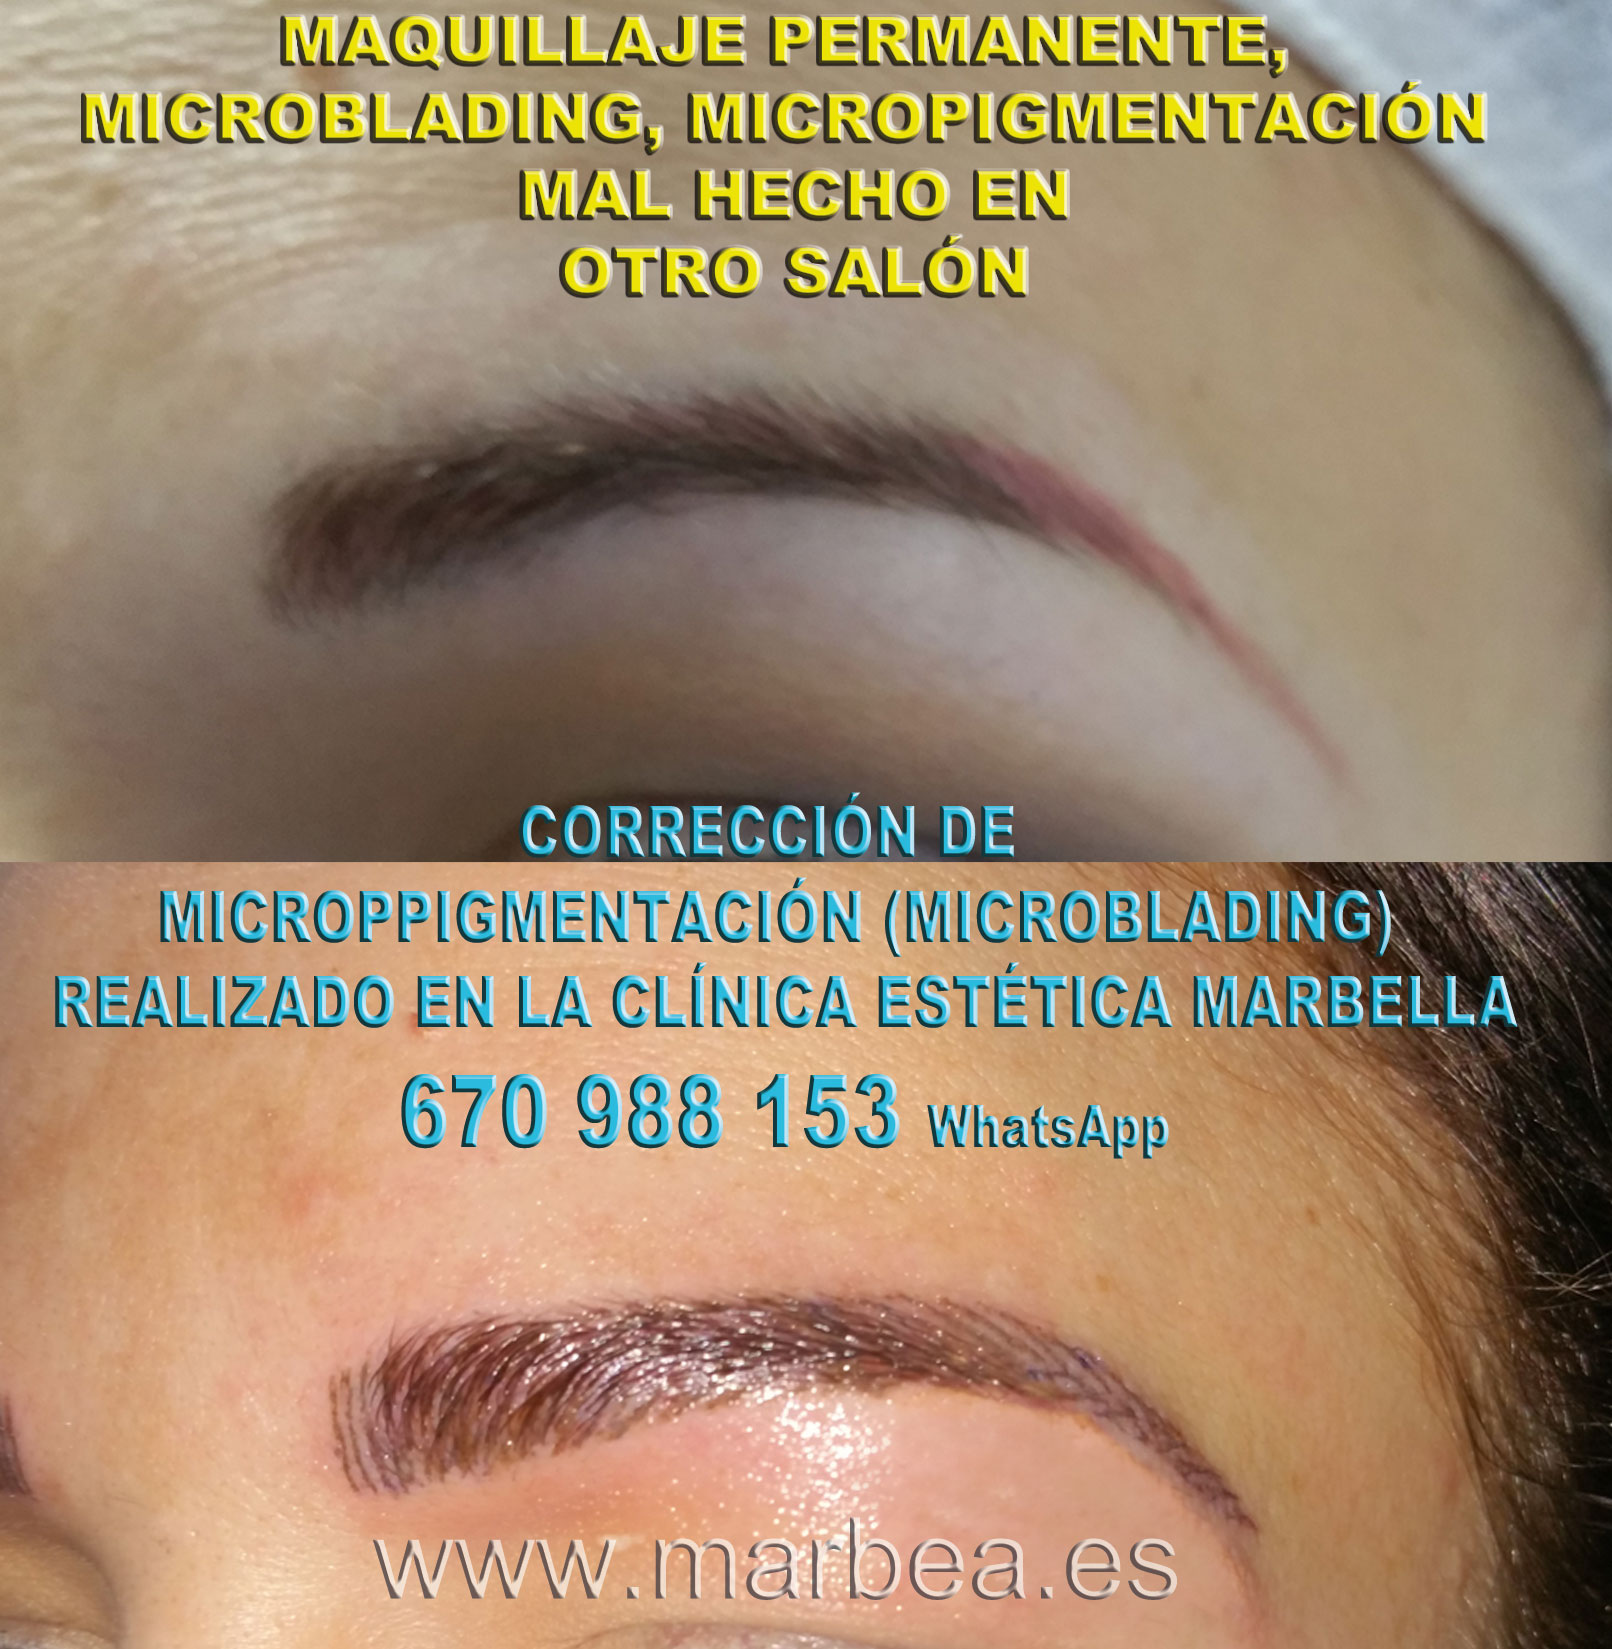 Borrar maquillaje permanente mal hecha clínica estética micropigmentación propone corrección de micropigmentación en cejas,corregir micropigmentación no deseada